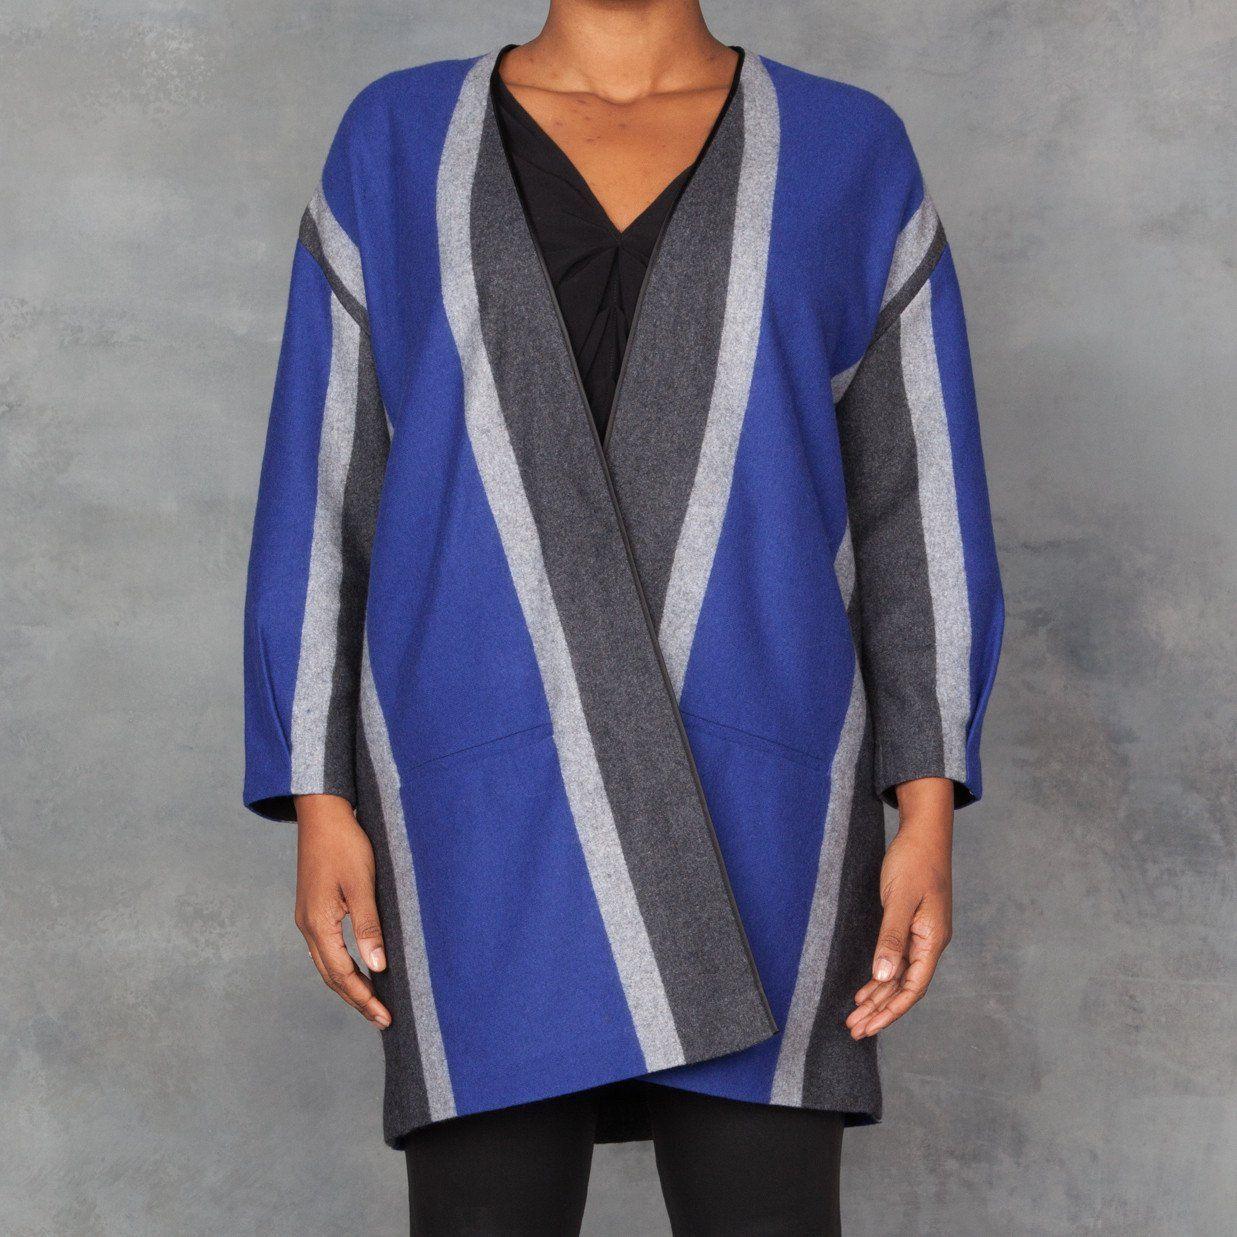 Wool cashmere flannel jacket  Giada Forte Striped Flannel Jacket  Products  Pinterest  Flannel